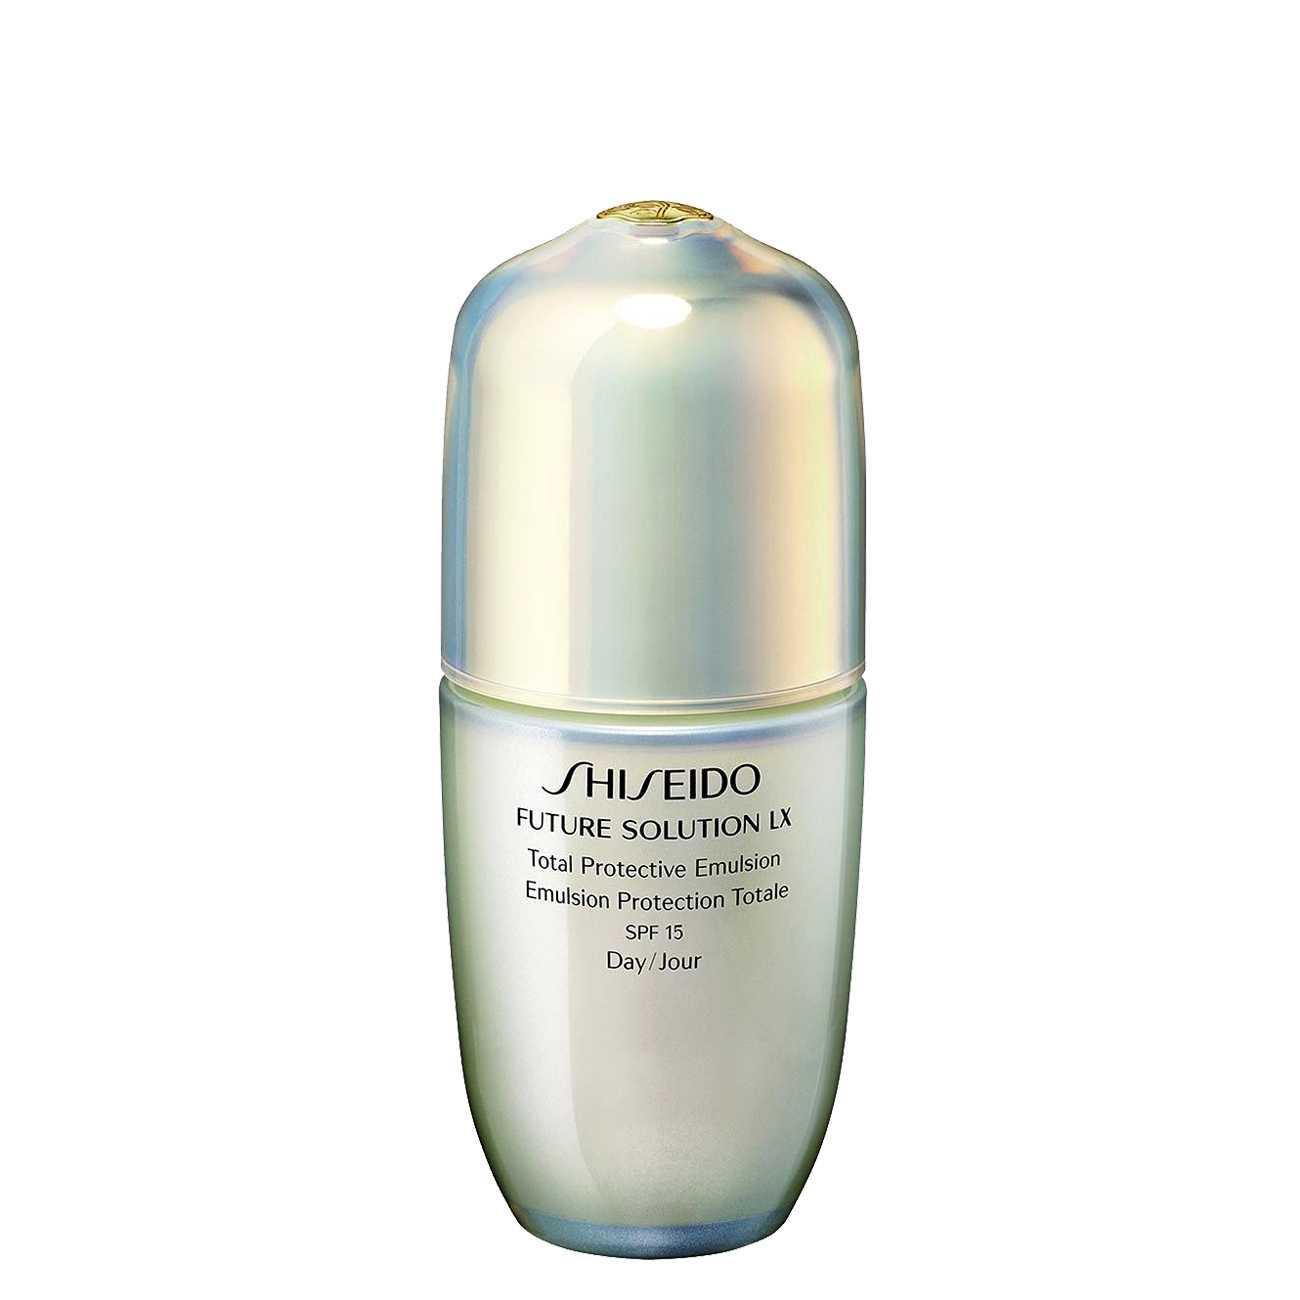 Future Solution Lx Total Protective Emulsion Spf15 75 Ml Shiseido imagine 2021 bestvalue.eu